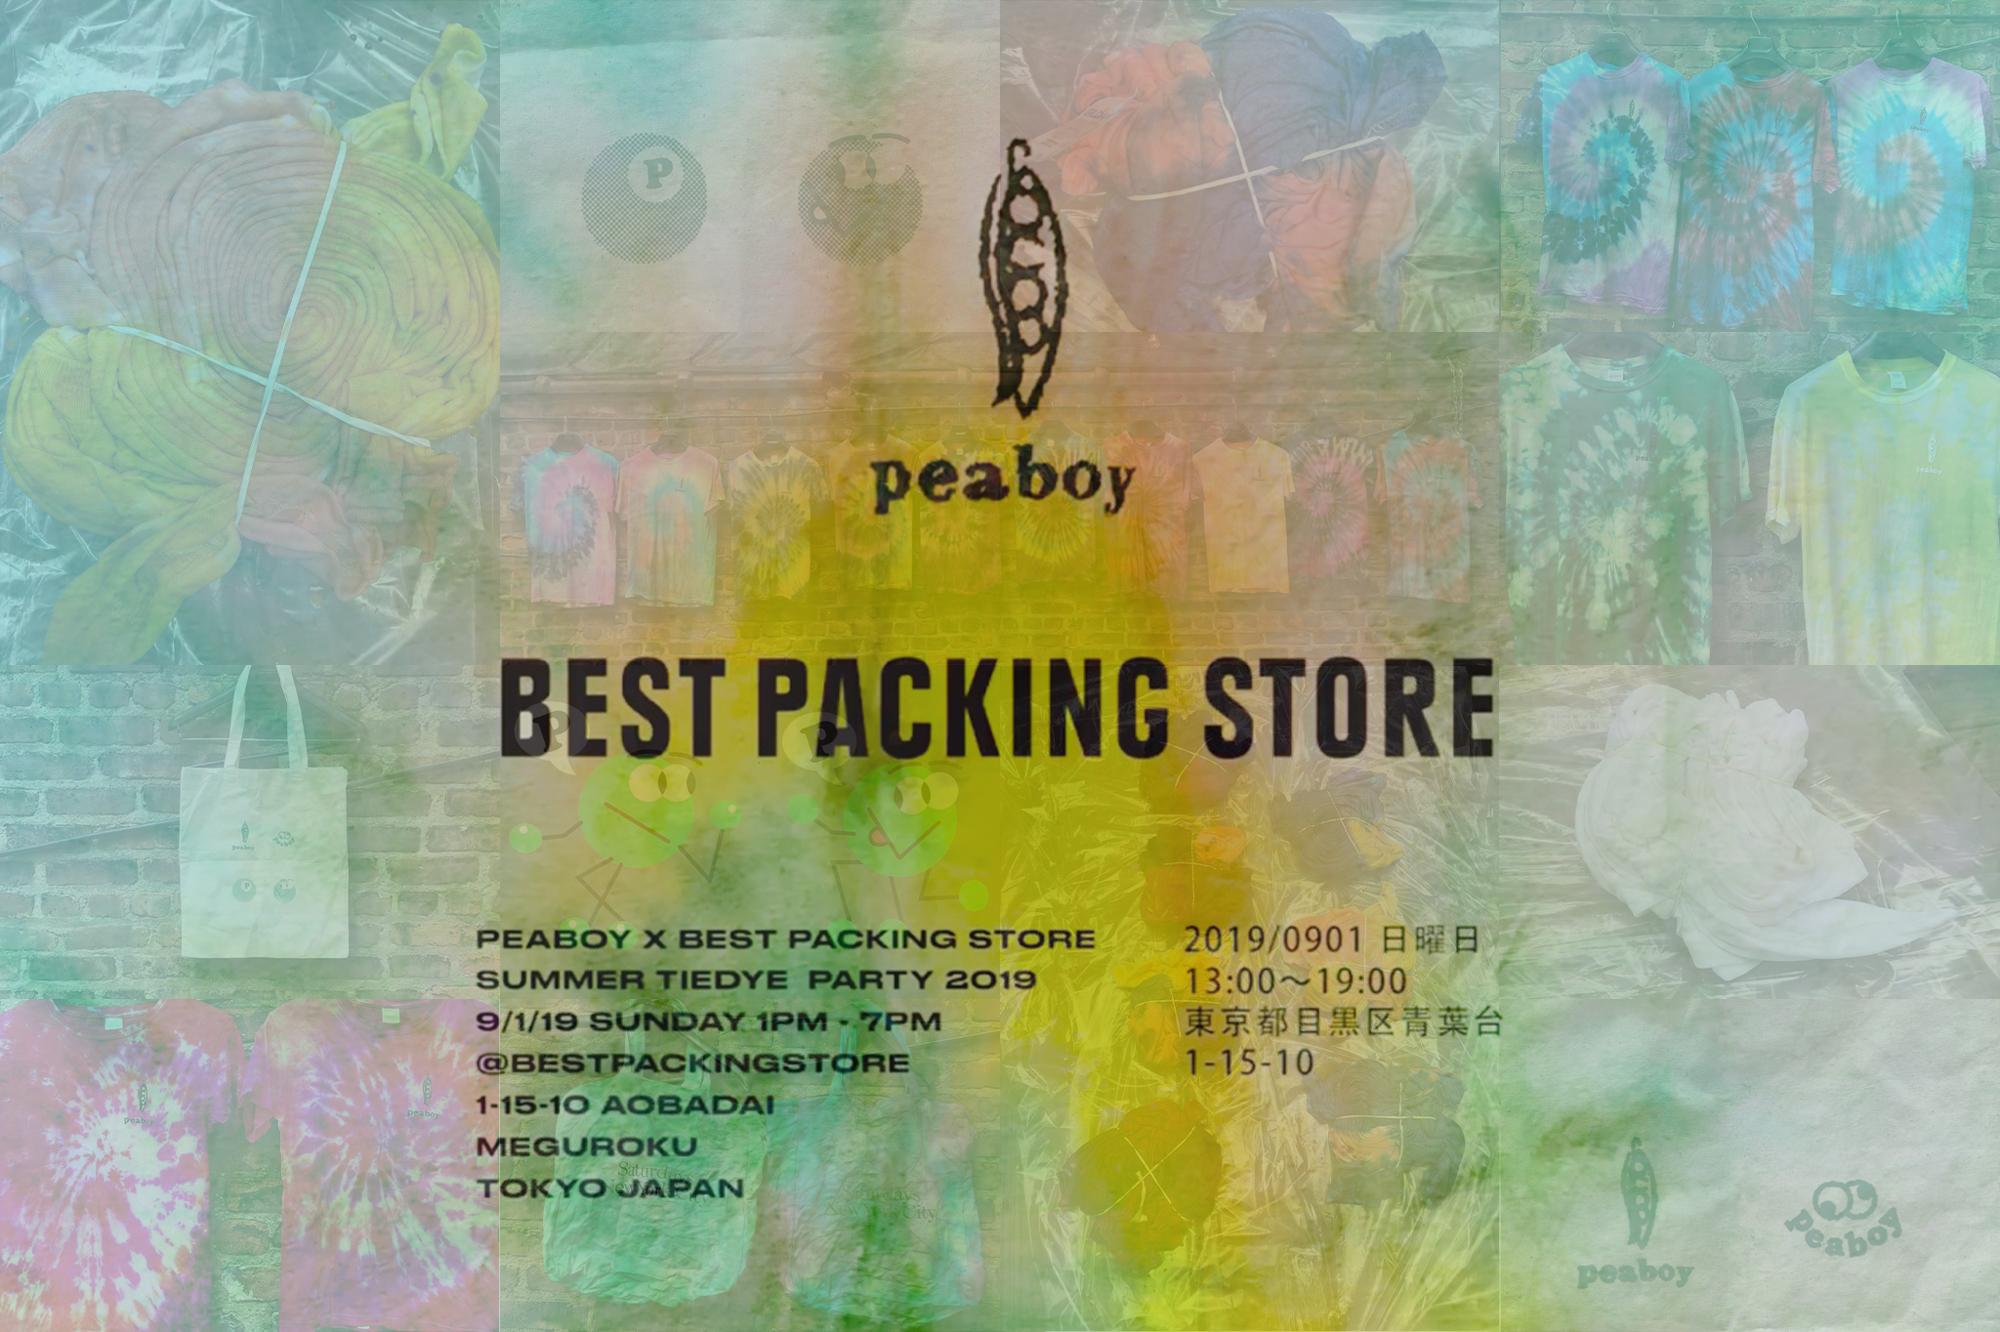 Peaboy × BEST PACKING STORE Workshop